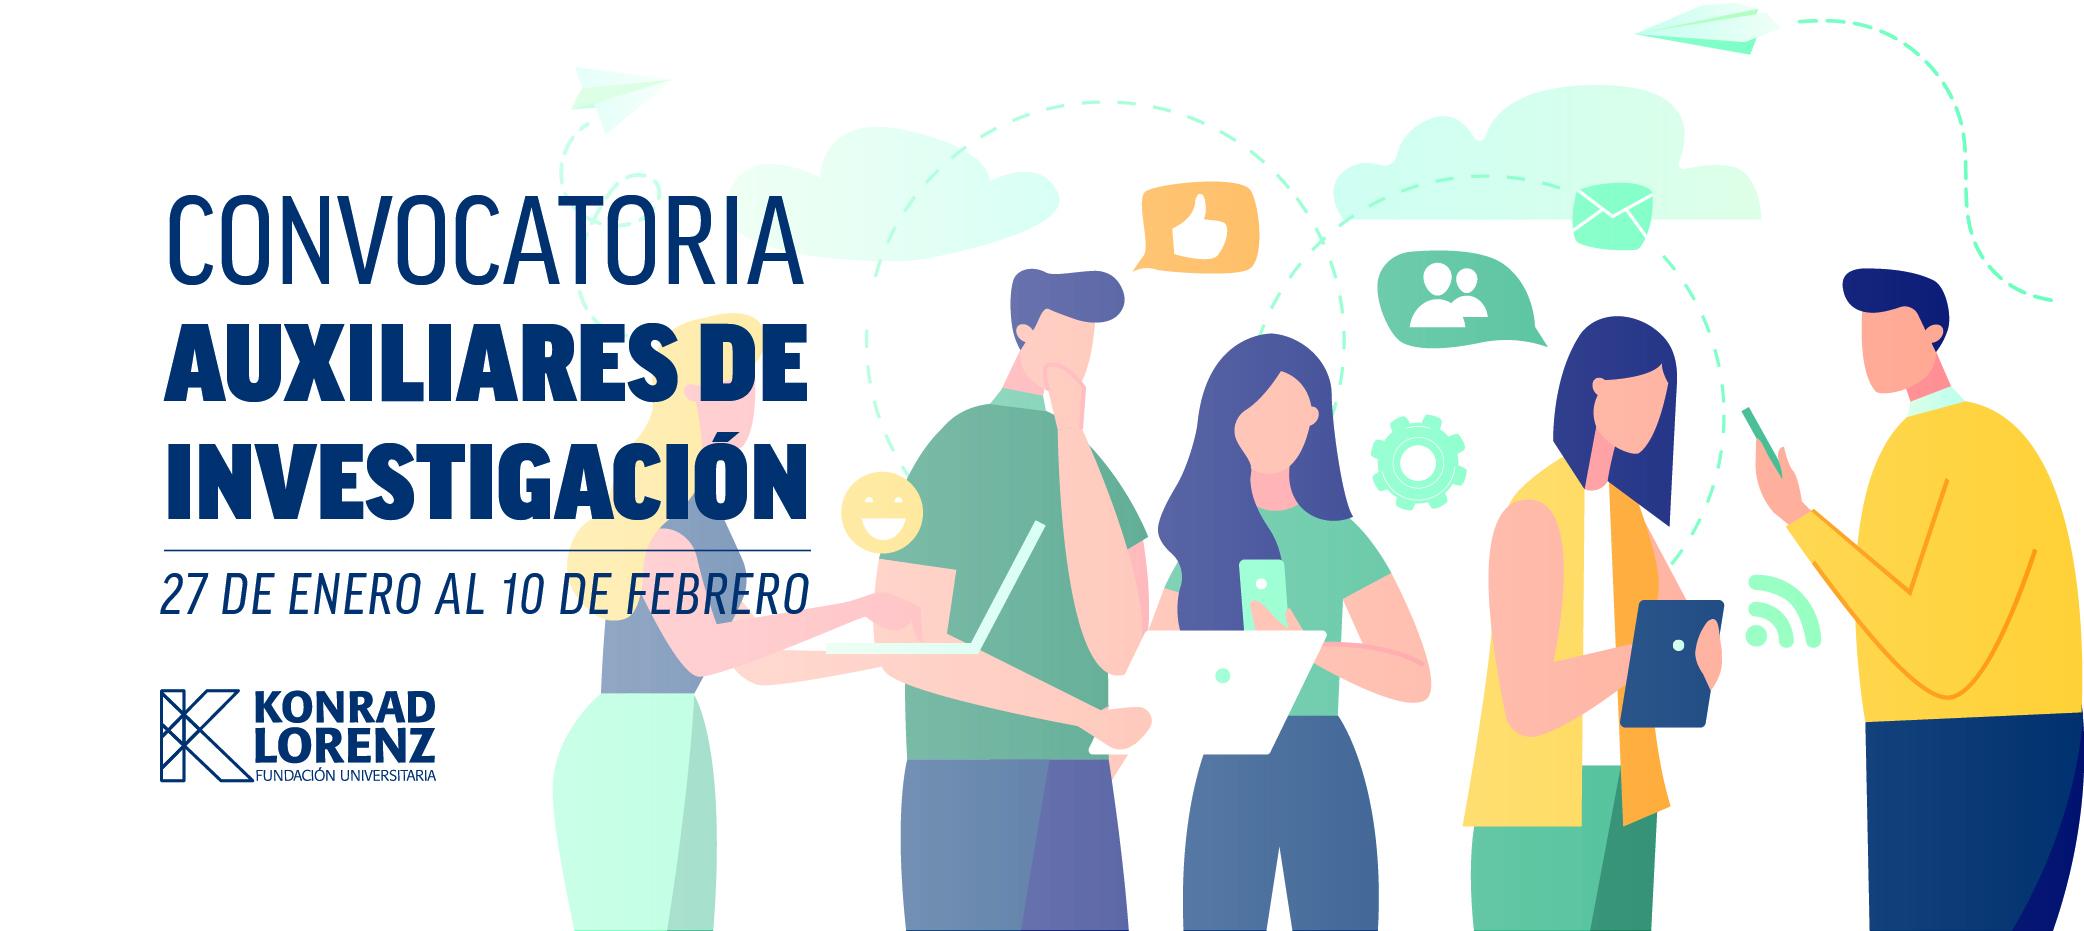 CONVOCATORIA INSTITUCIONAL AUXILIARES DE INVESTIGACIÓN 2020-1 / 2020-2